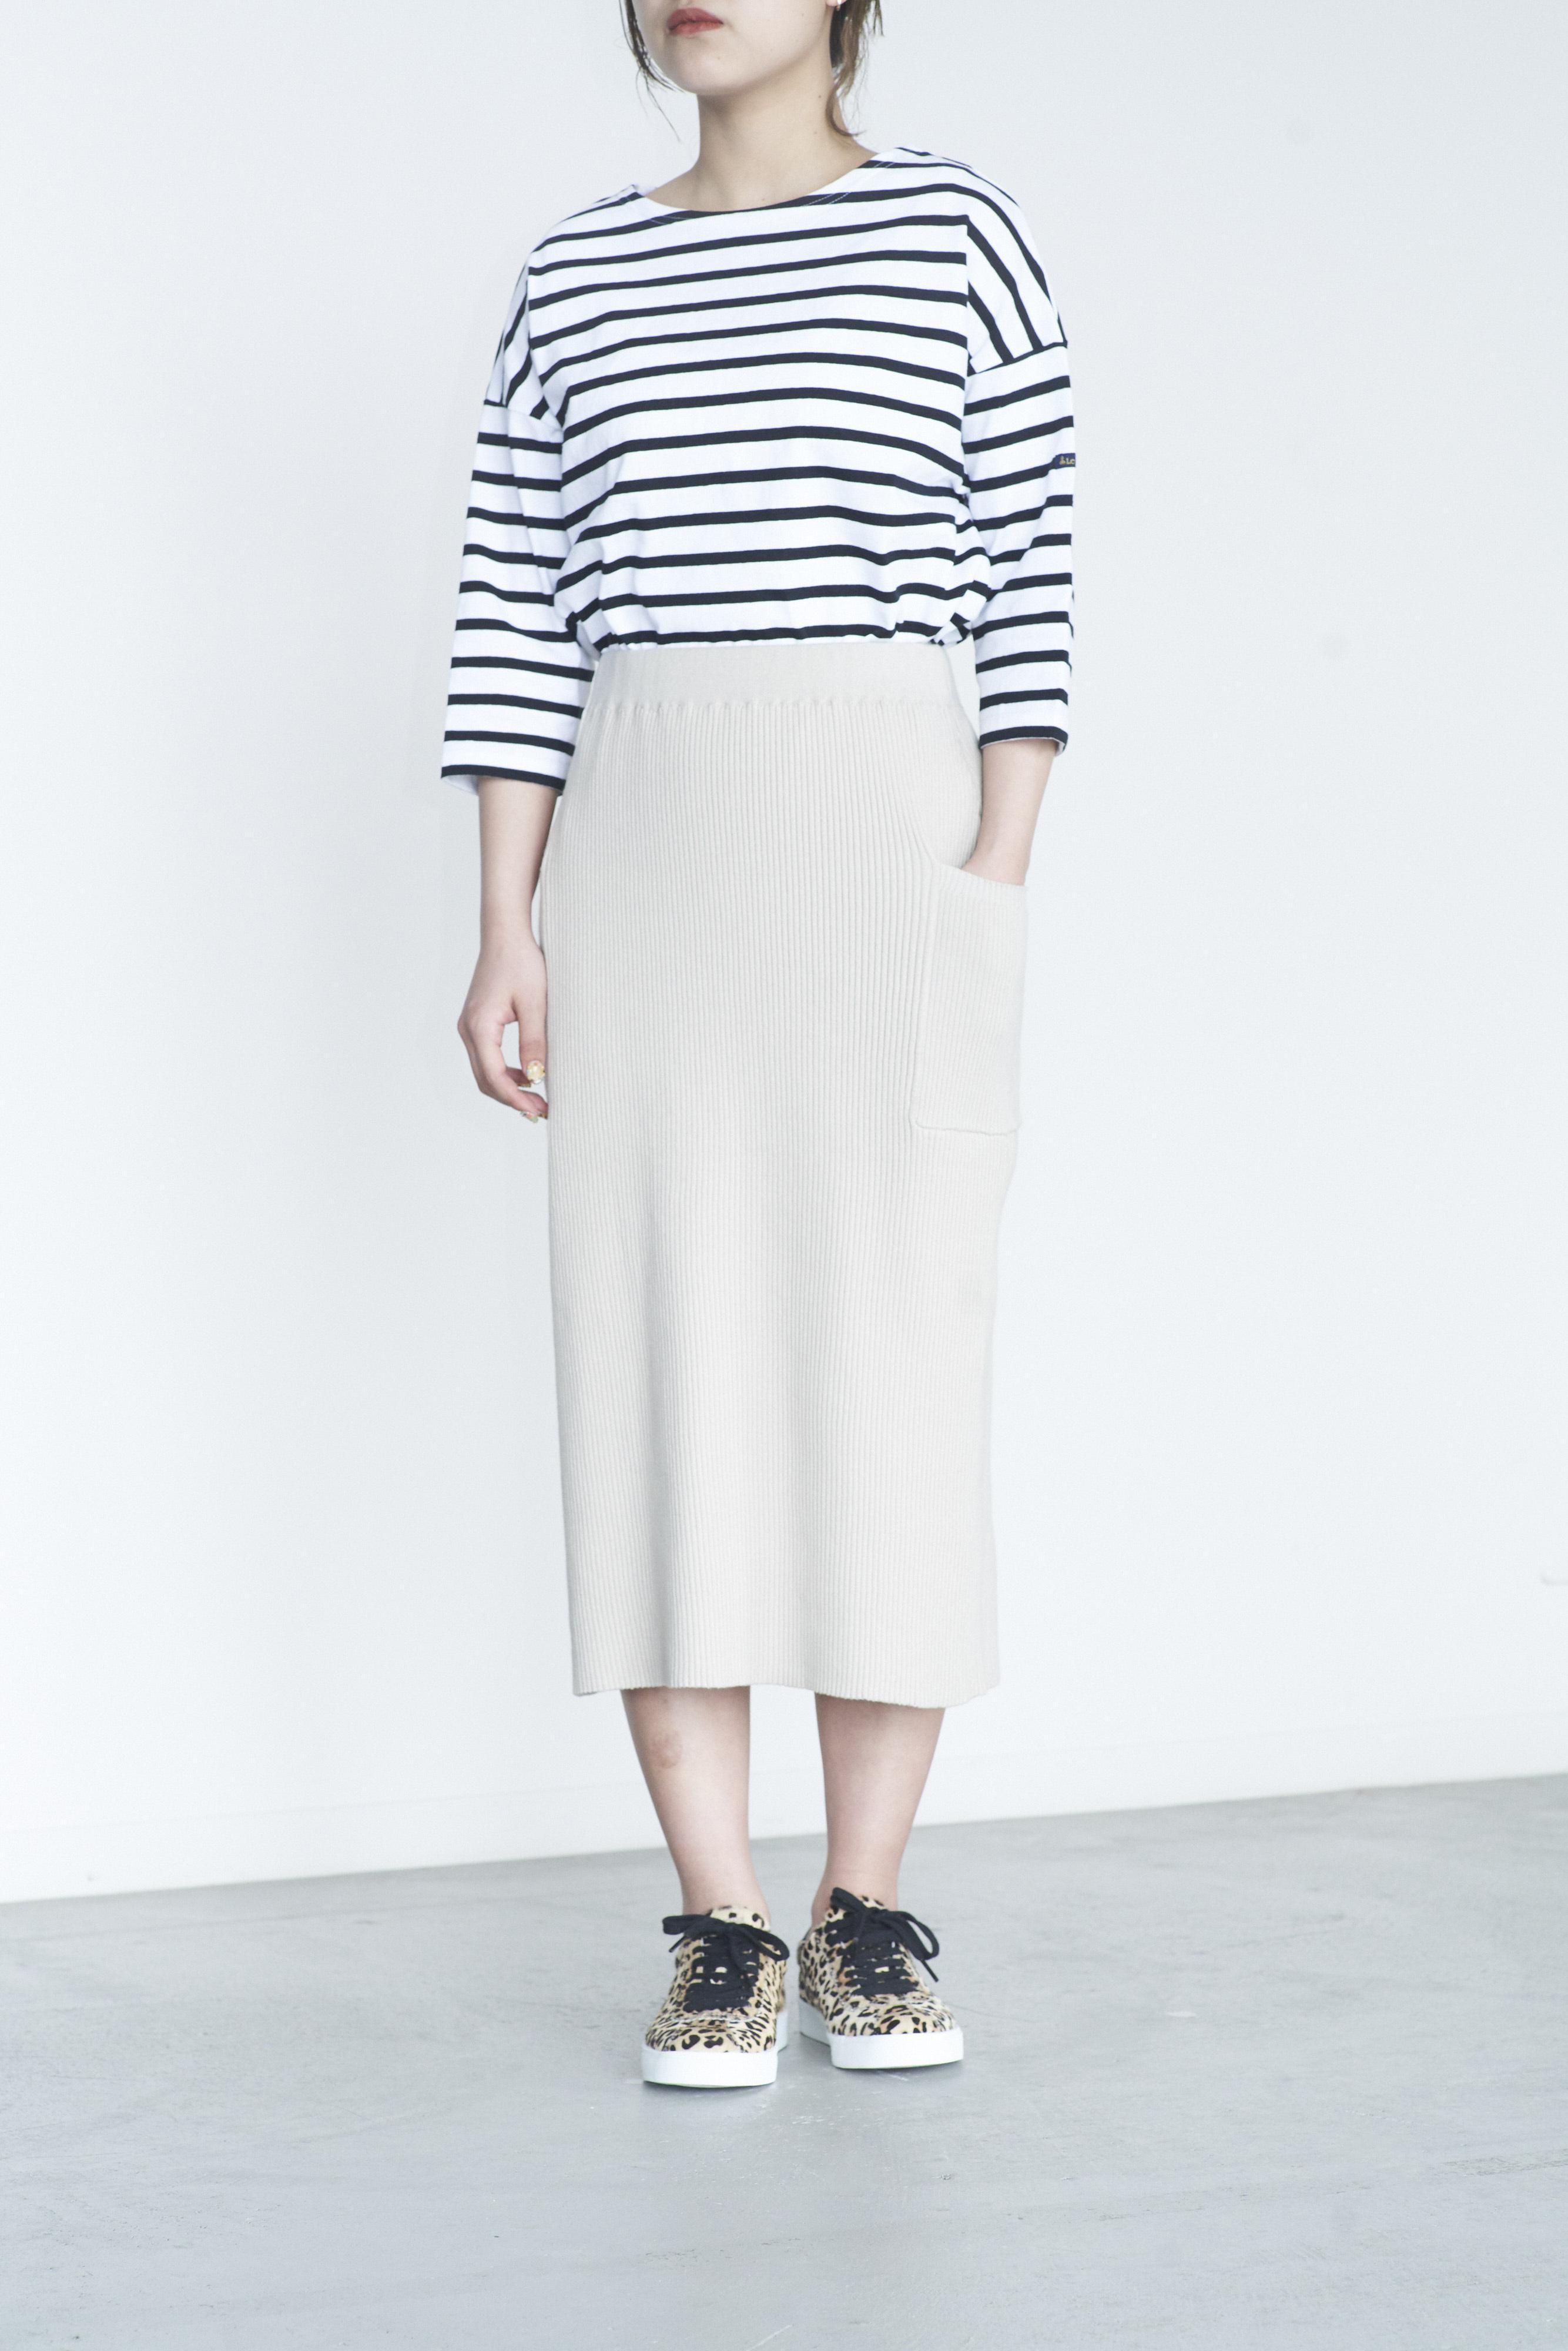 Audrey and John Wad Tight skirt